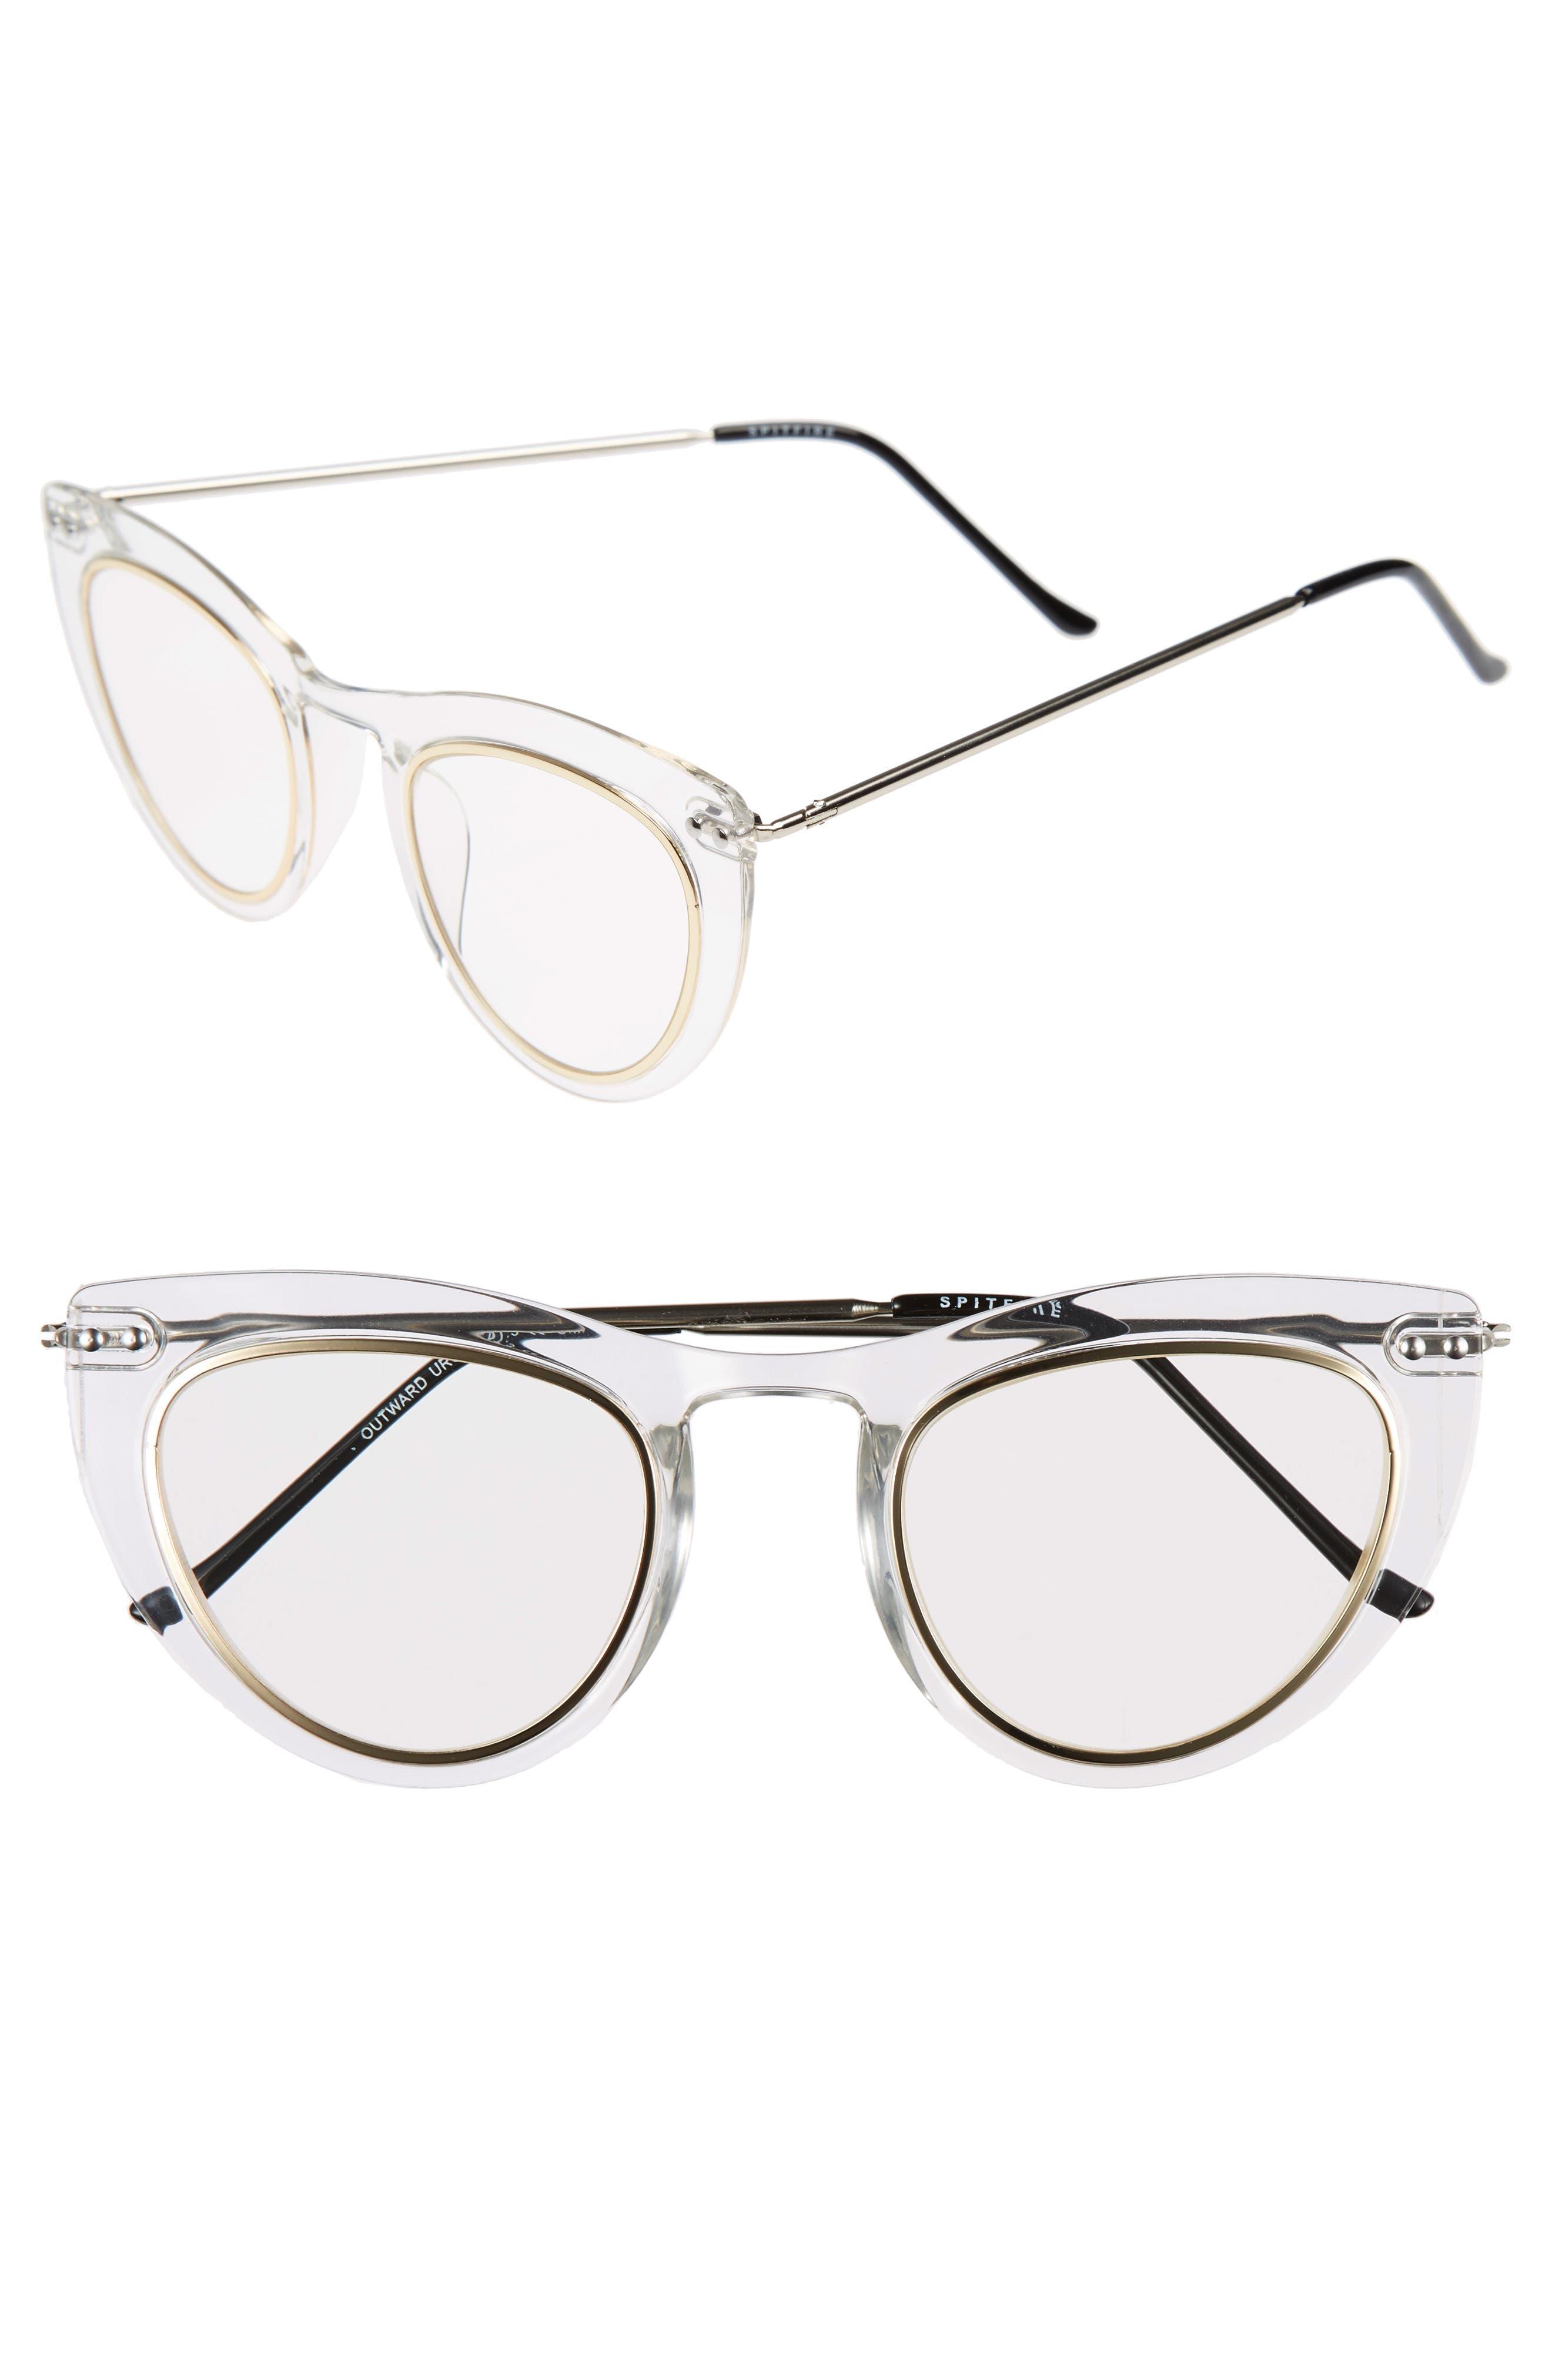 Spitfire Outward Urge 50mm Cat Eye Sunglasses